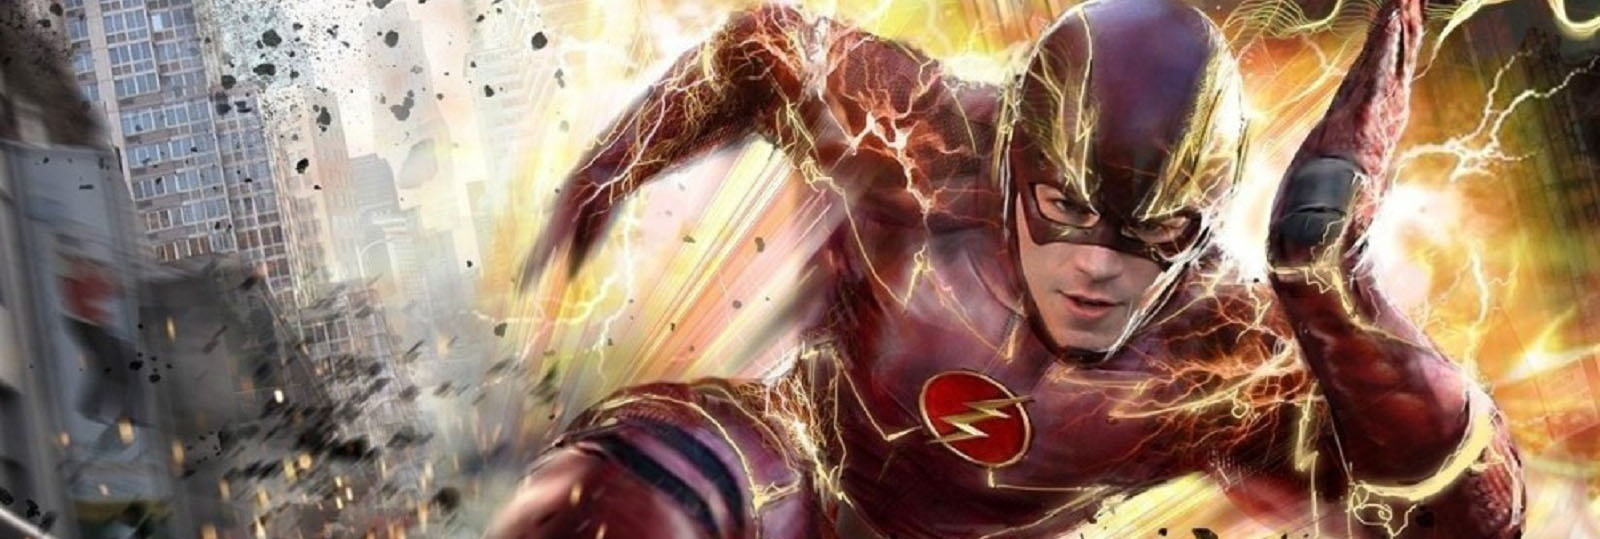 سريال بسيار زيبا و محبوب The Flash محصول سال 2014 آمريکا